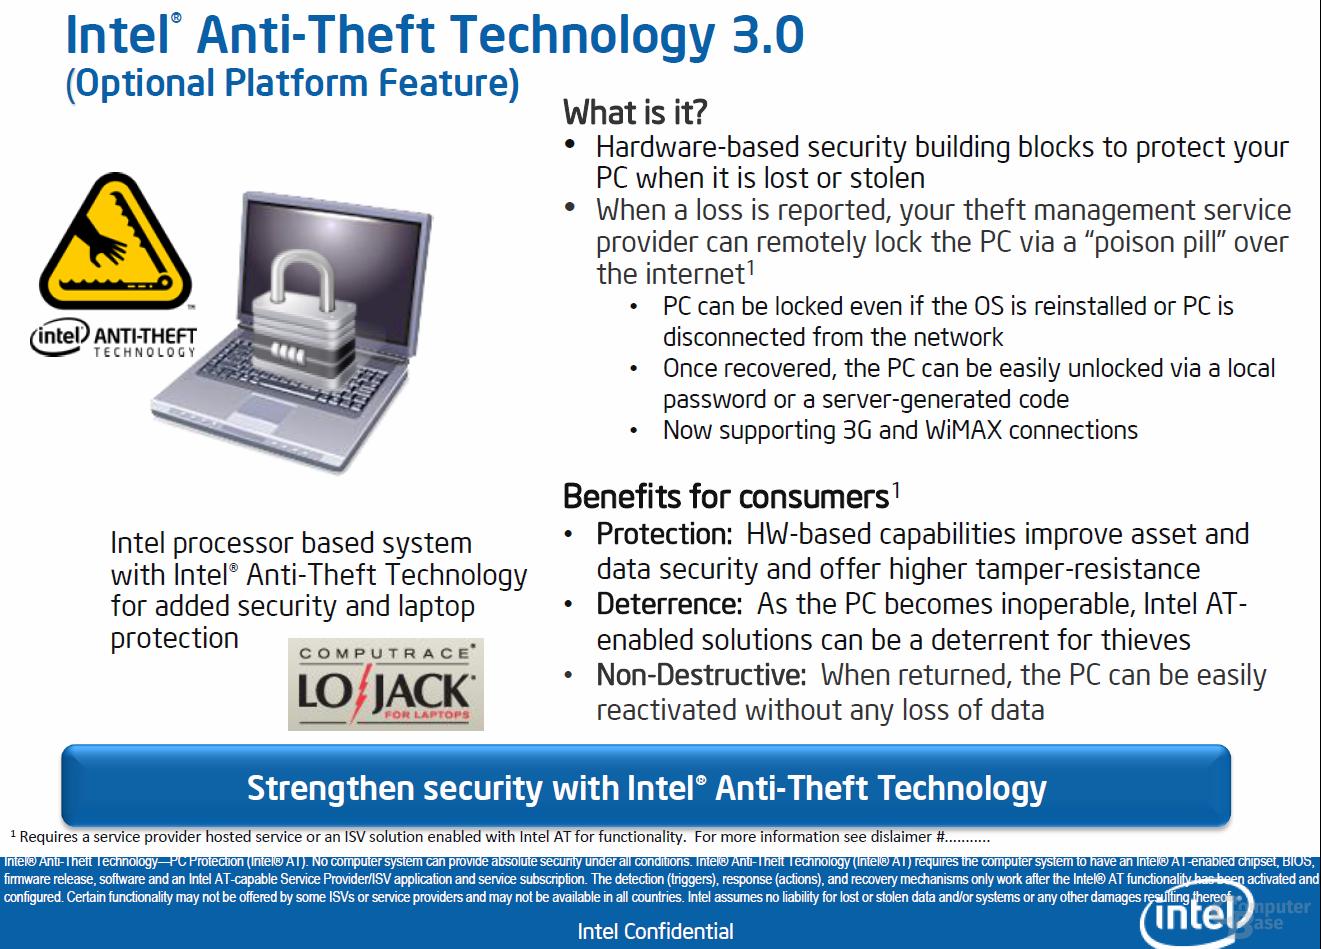 Intel Anti-Theft Technology 3.0